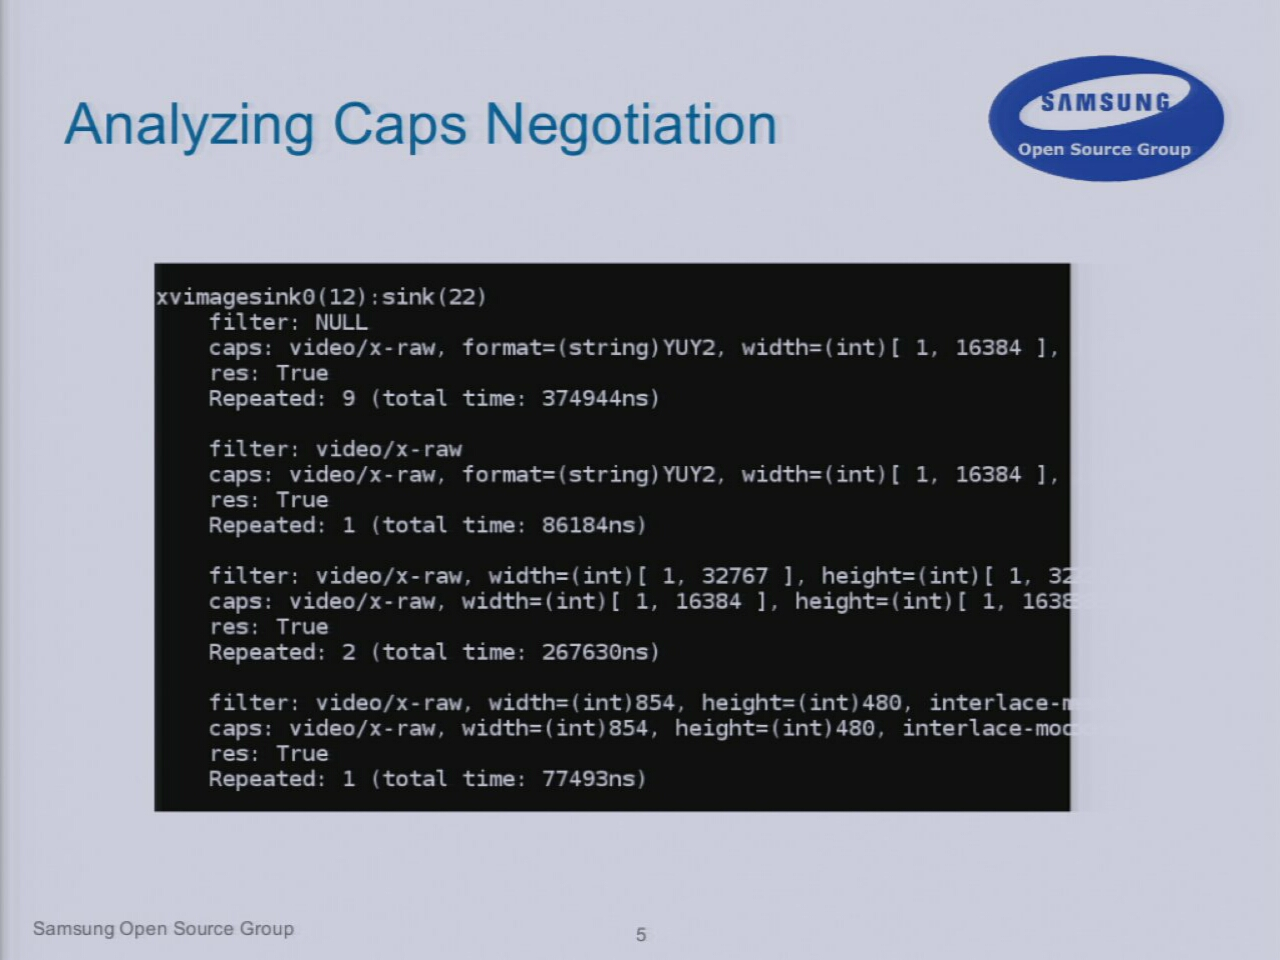 Analyzing Caps Negotiation (Using GstTracer) - GStreamer